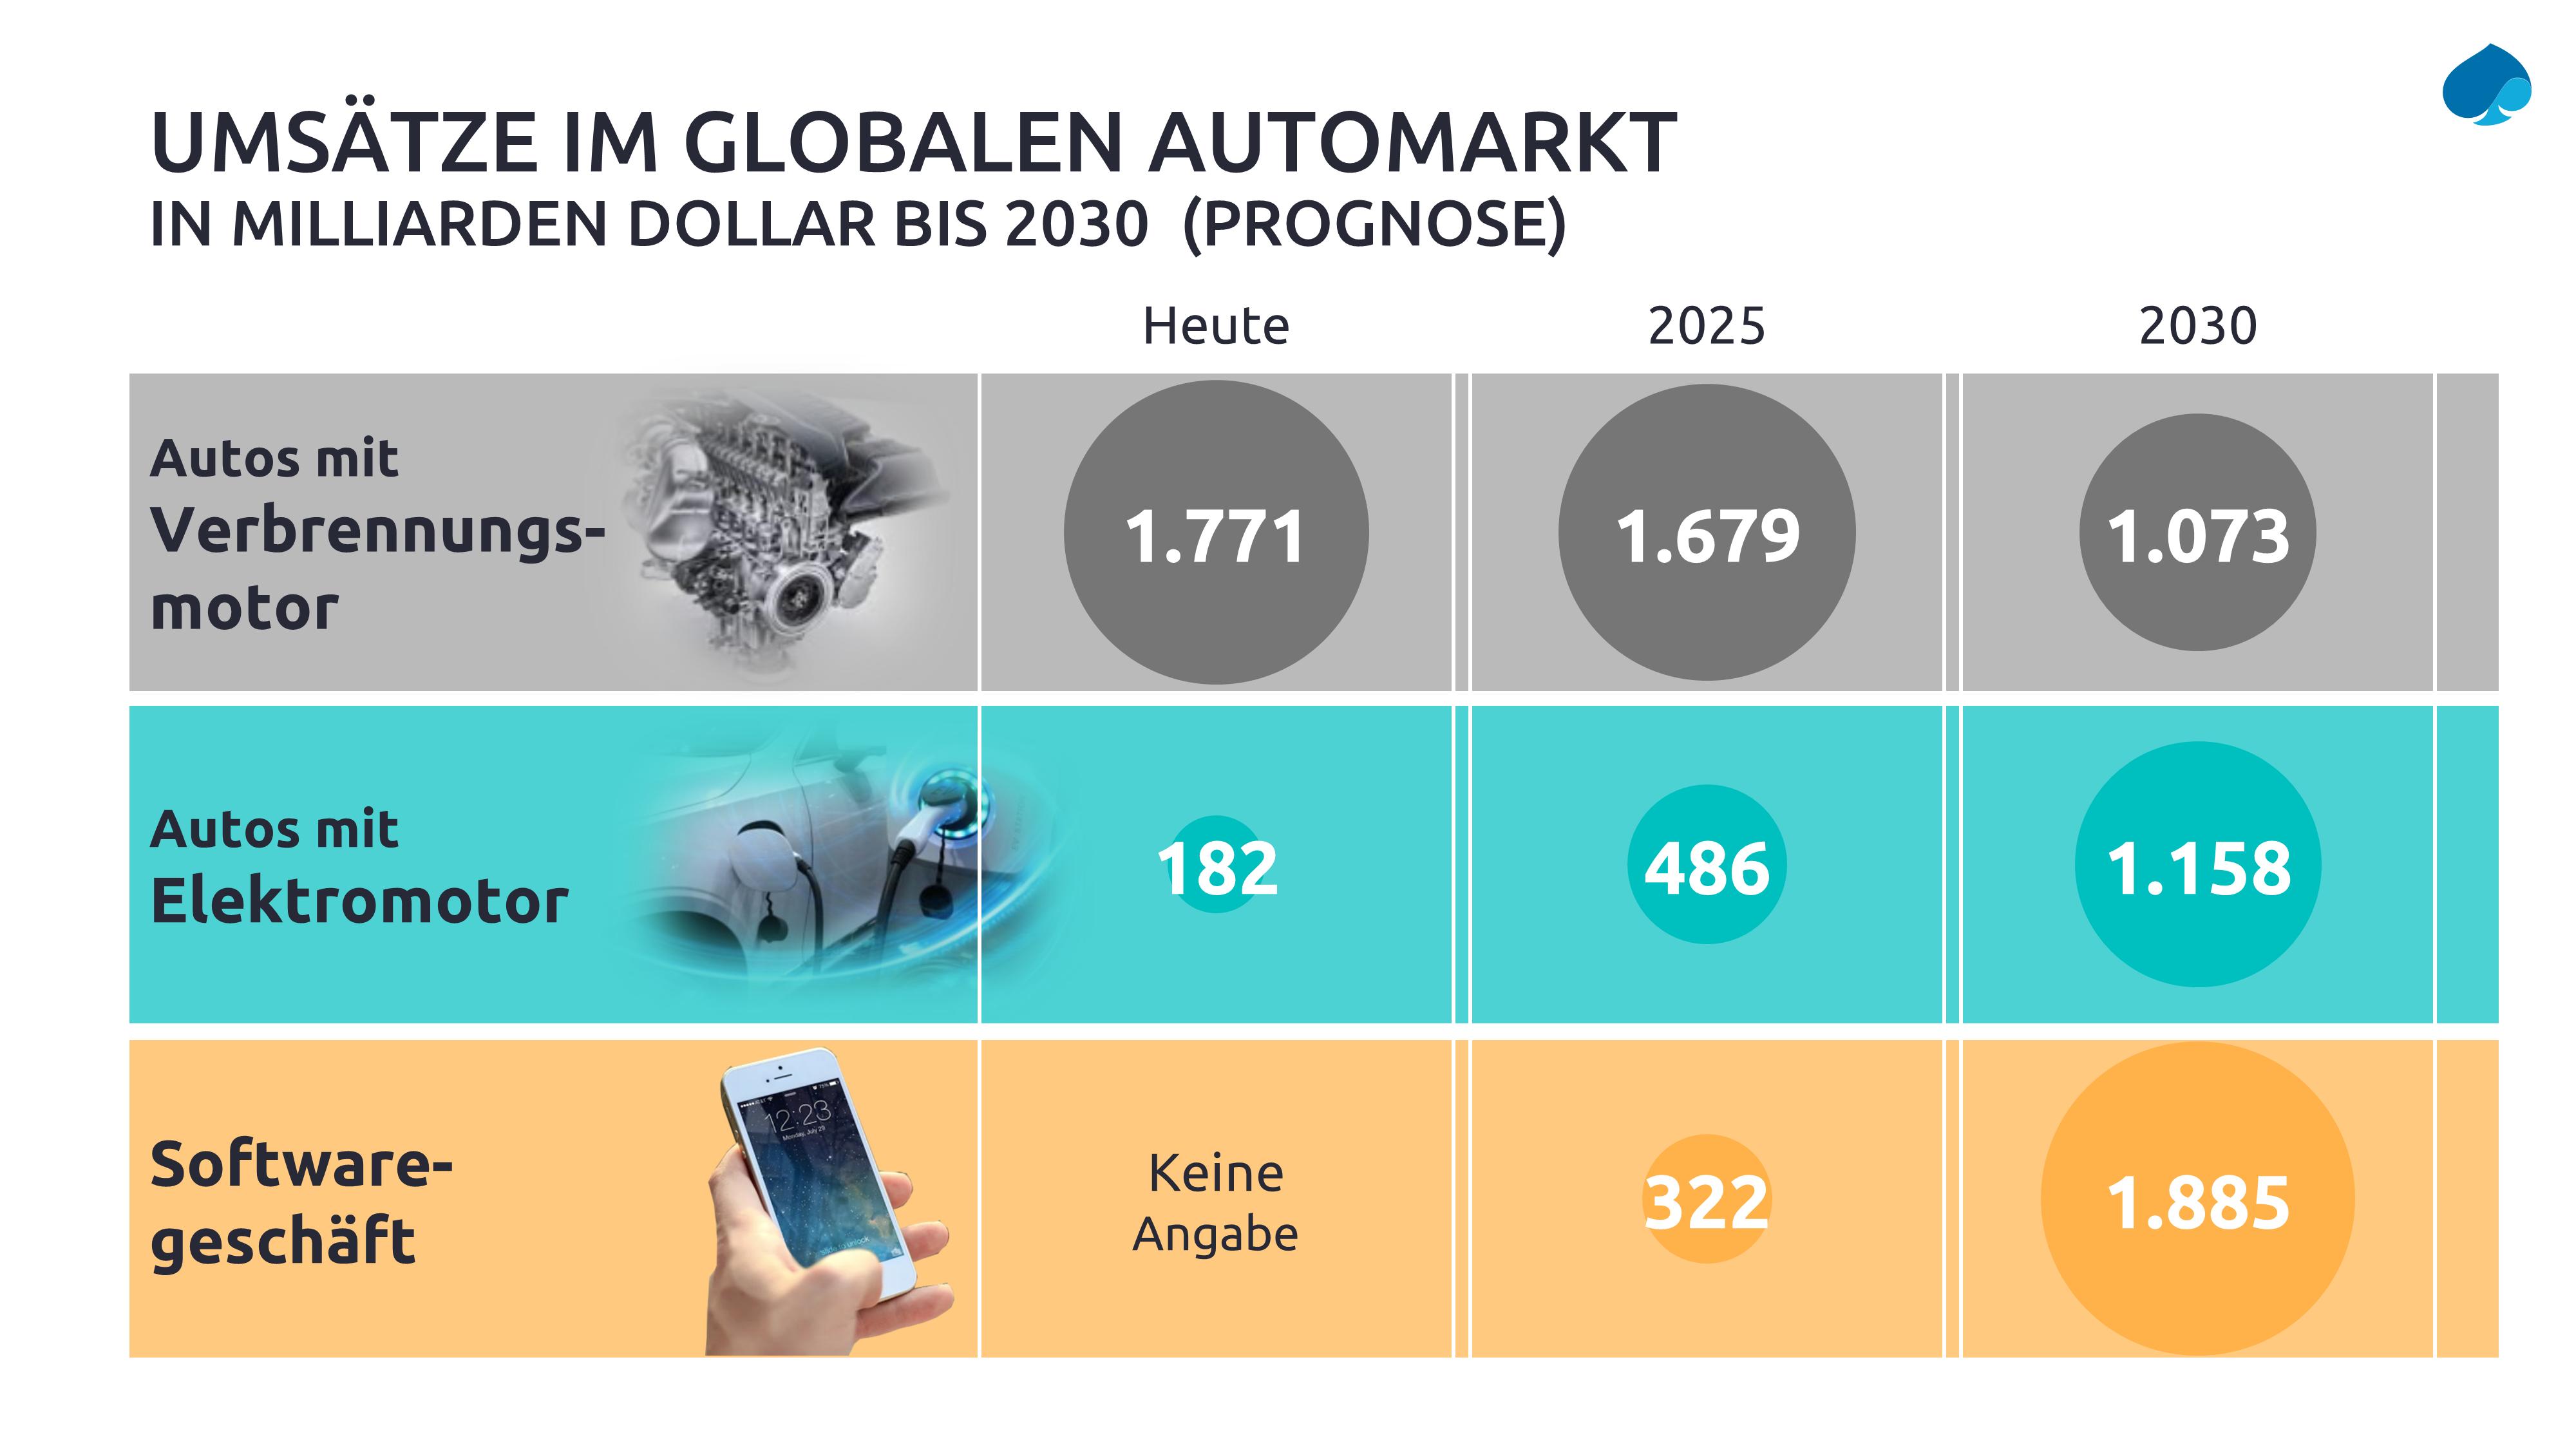 Umsaetze-im-globalen-Automarkt_Capgemini-Invent